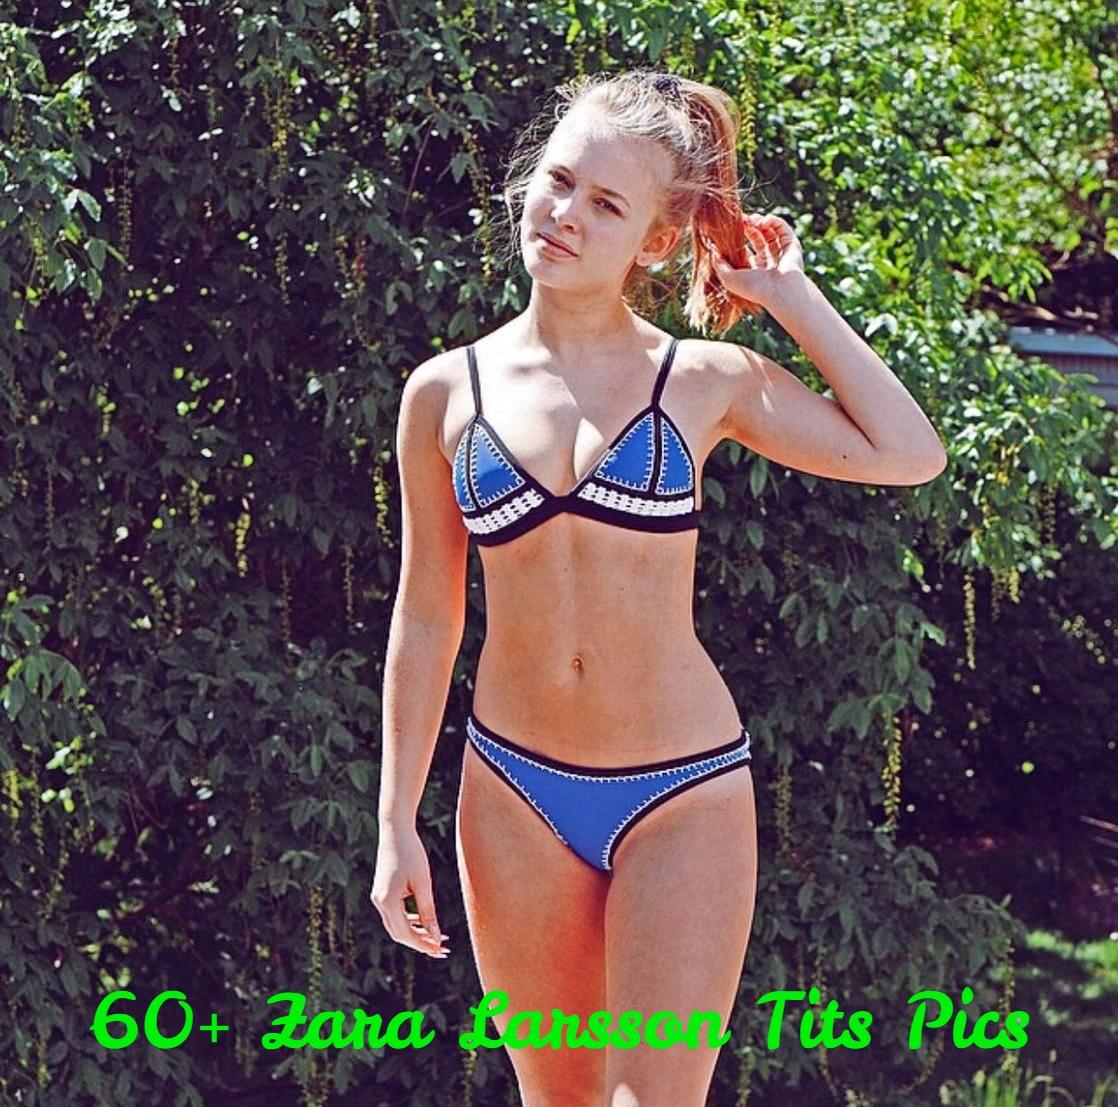 Zara Larsson boobs pics